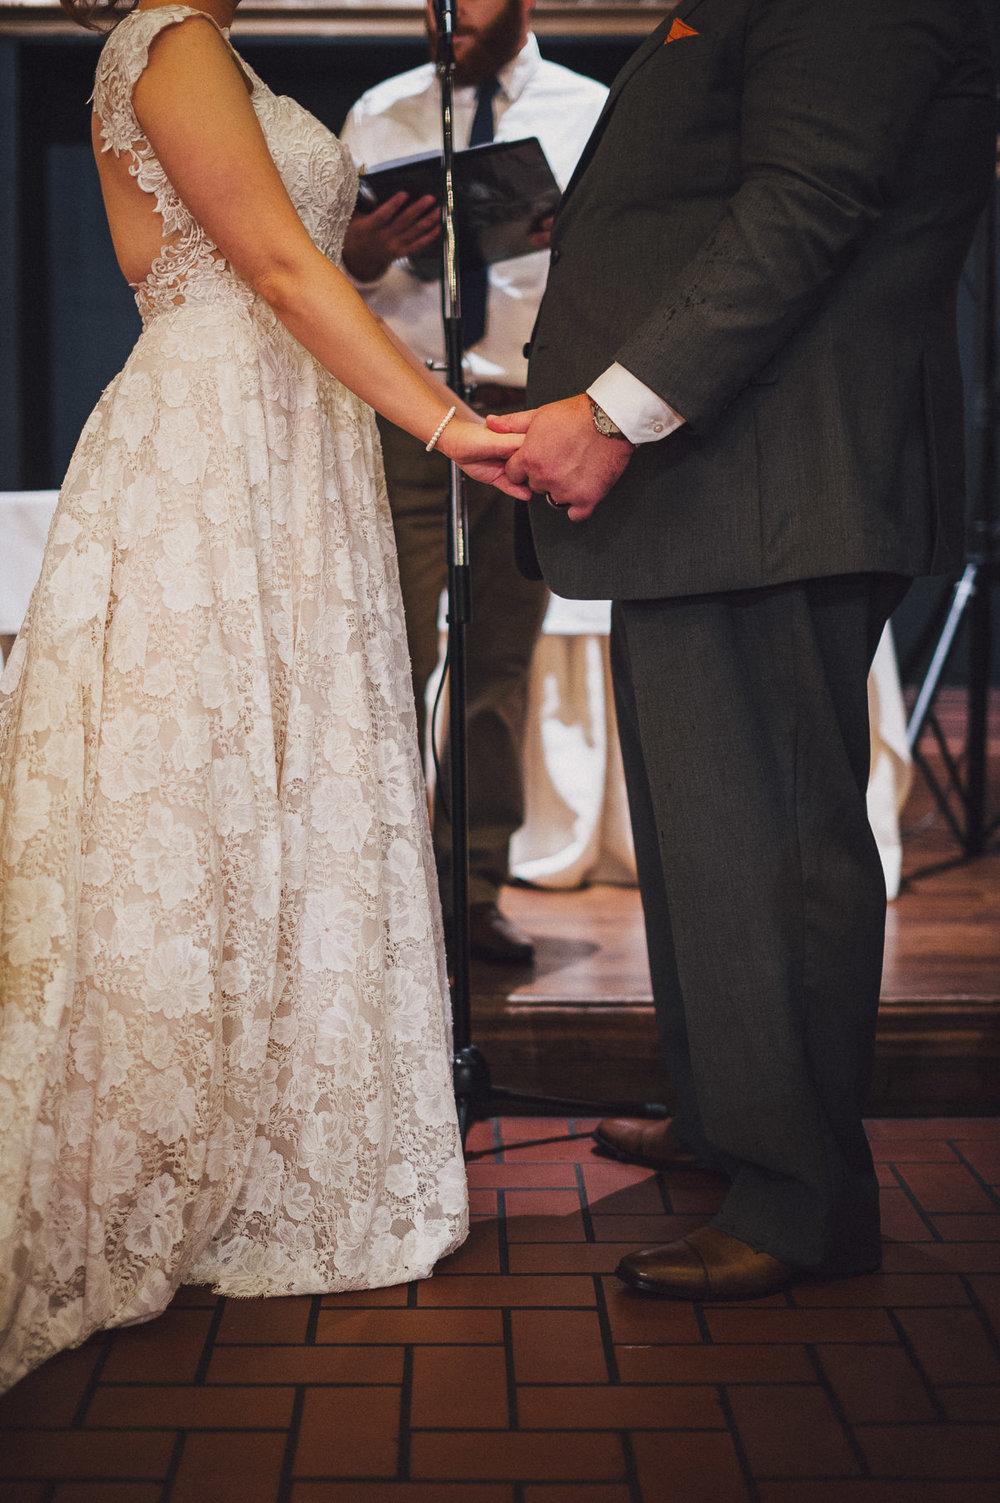 breighton-and-basette-photography-copyrighted-image-blog-amanda-and-eric-wedding-084.jpg